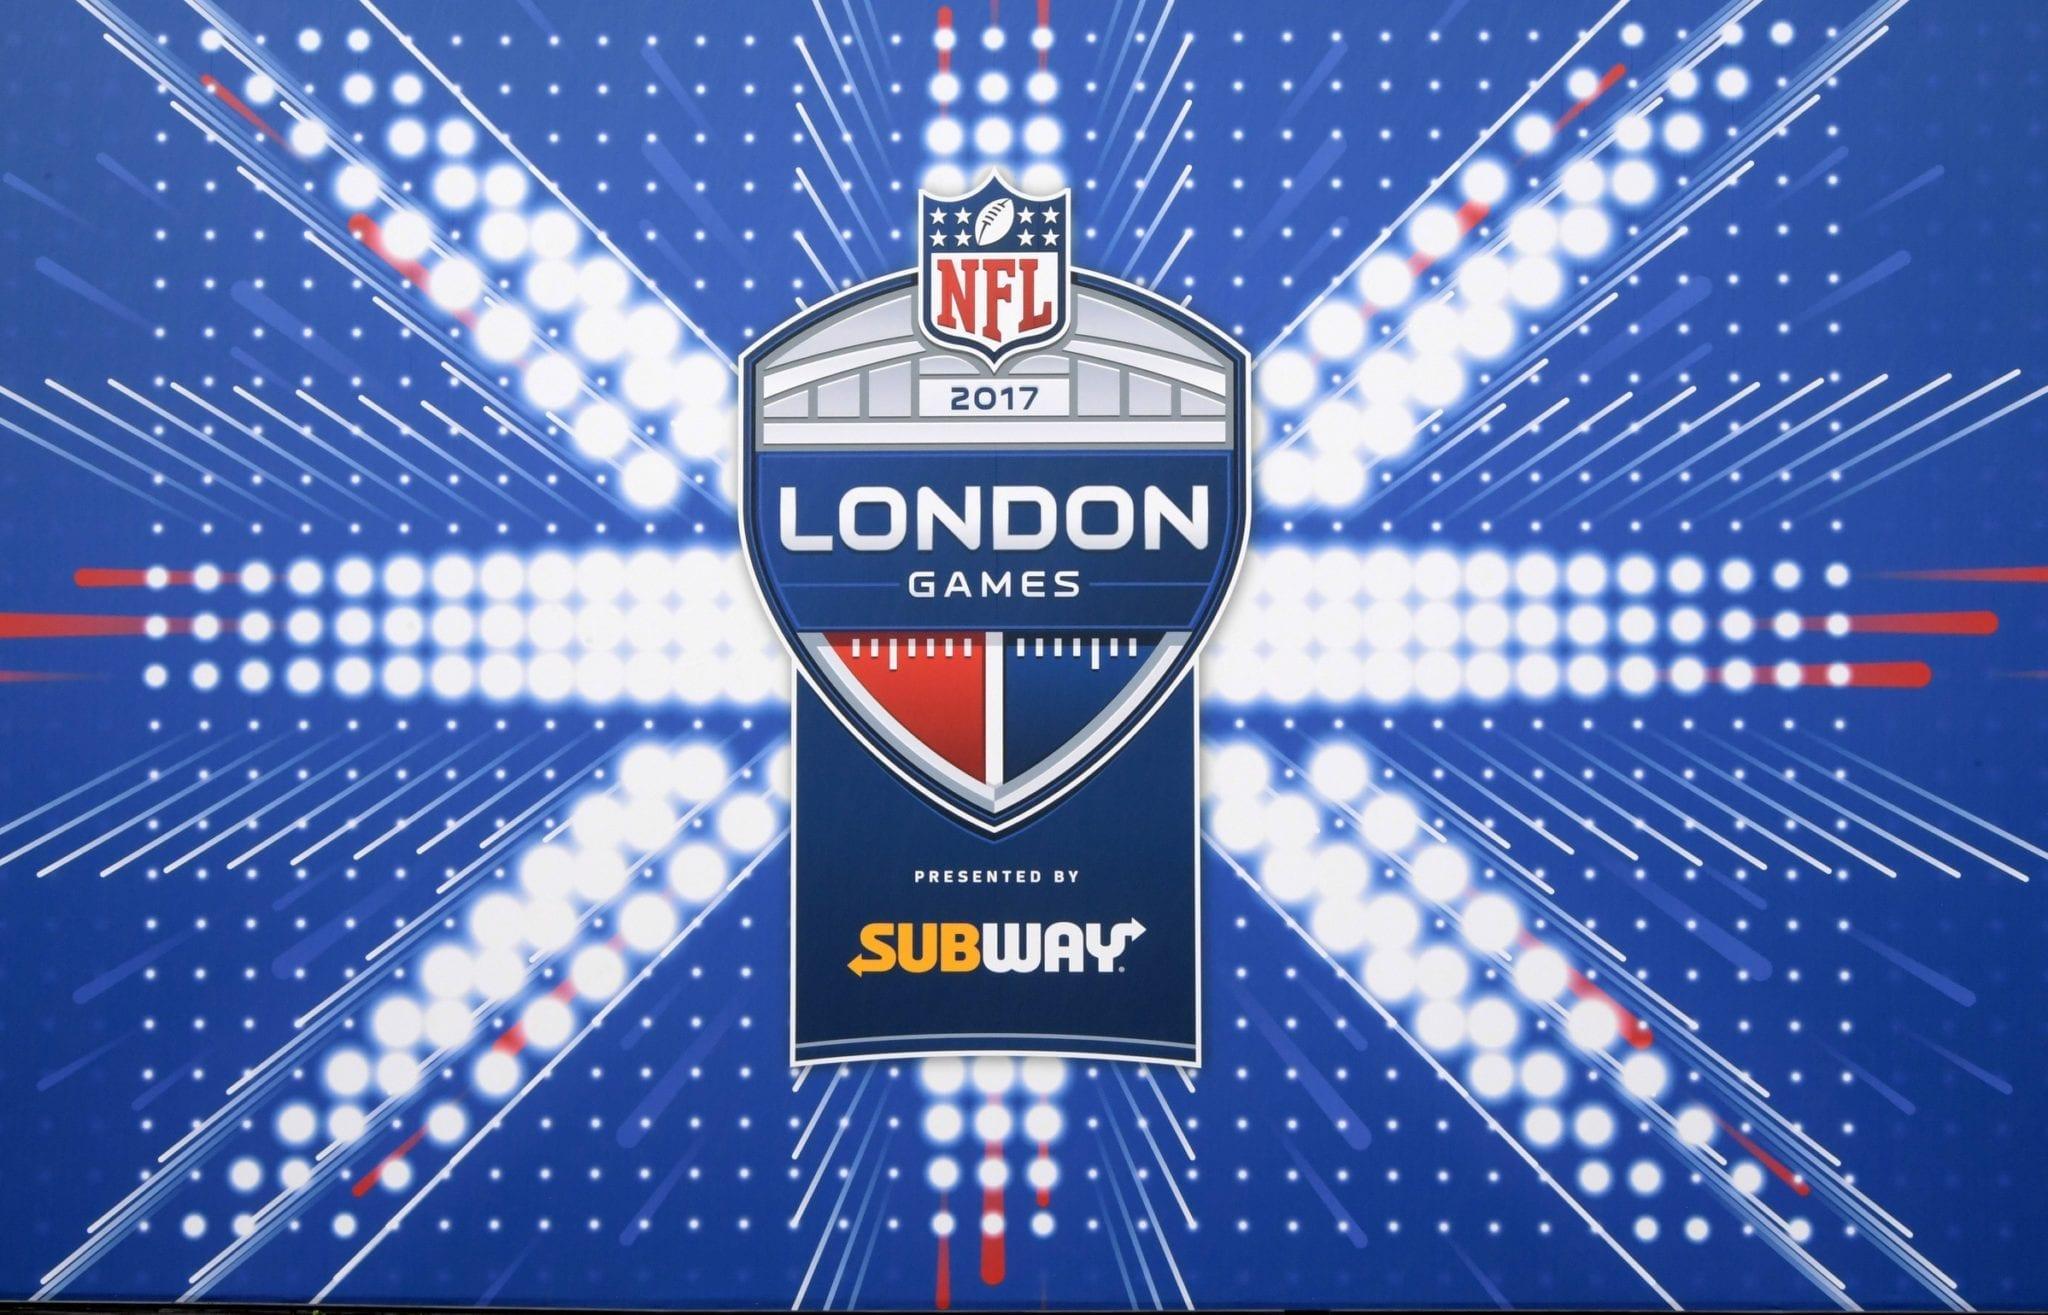 London Games Nfl 2021